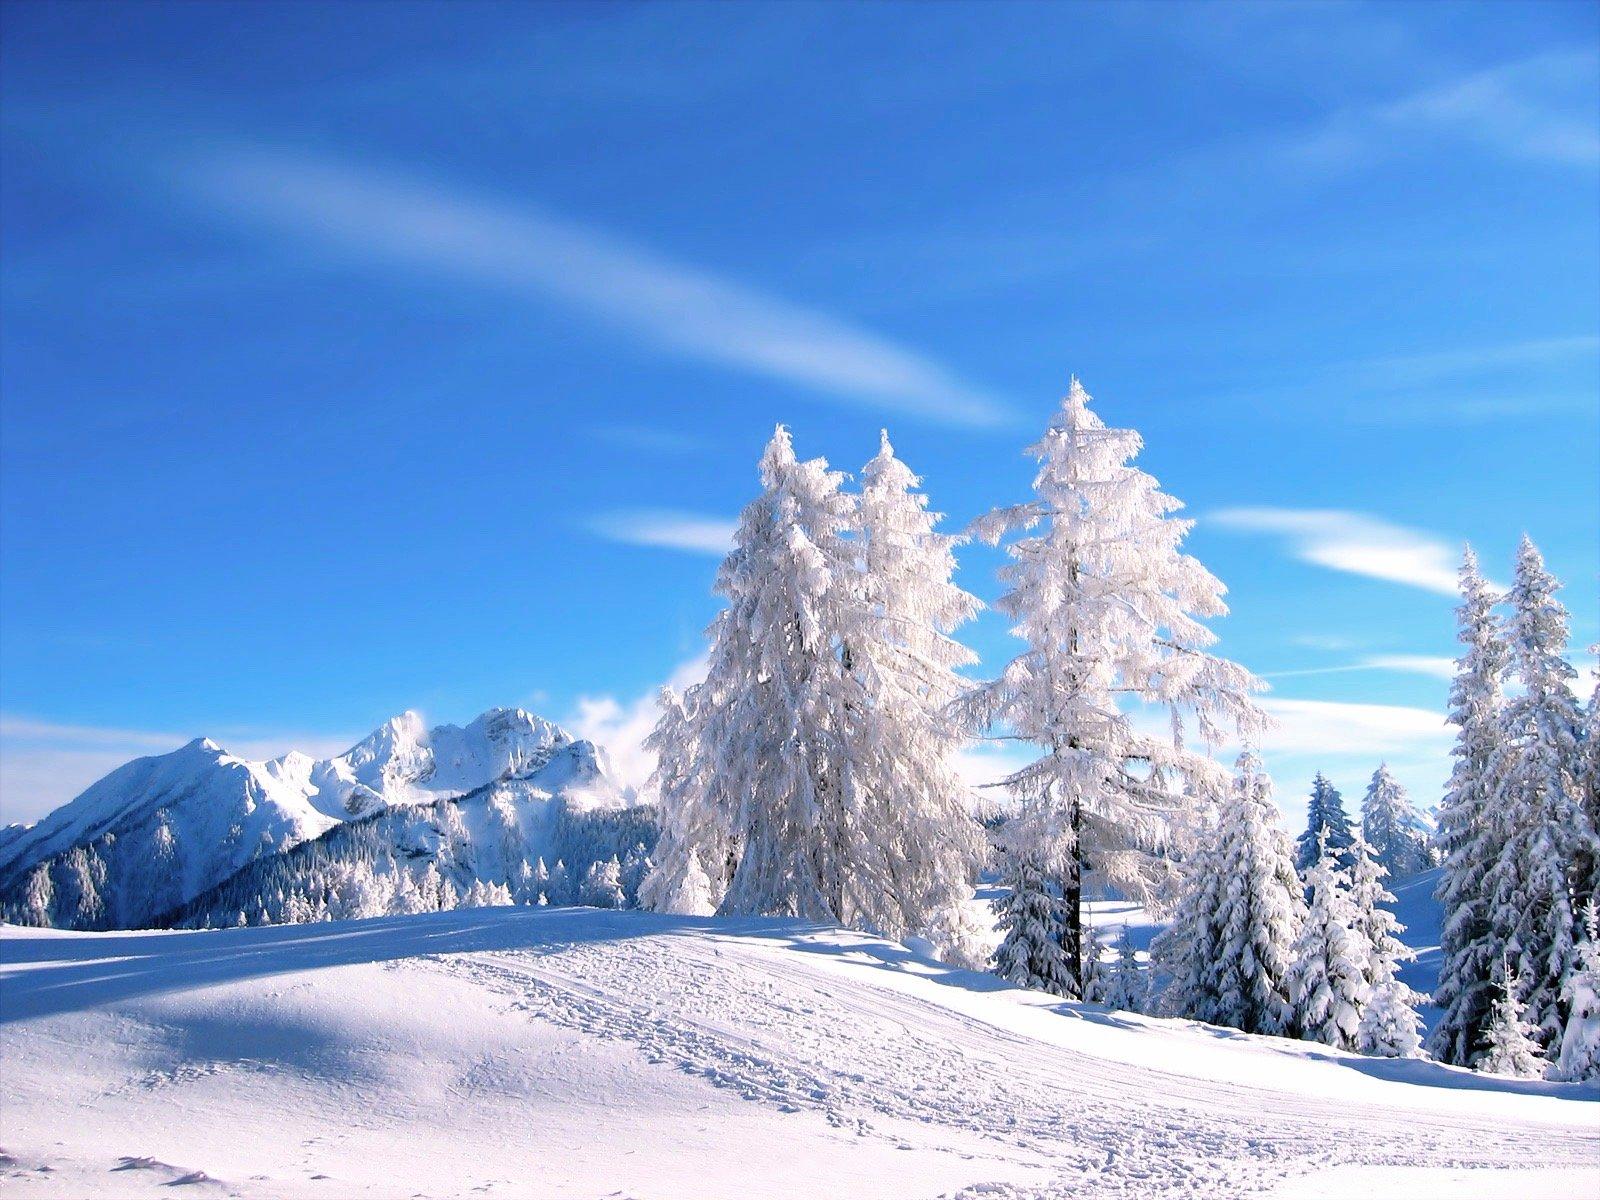 landscape-winter-wallpaper canada blog